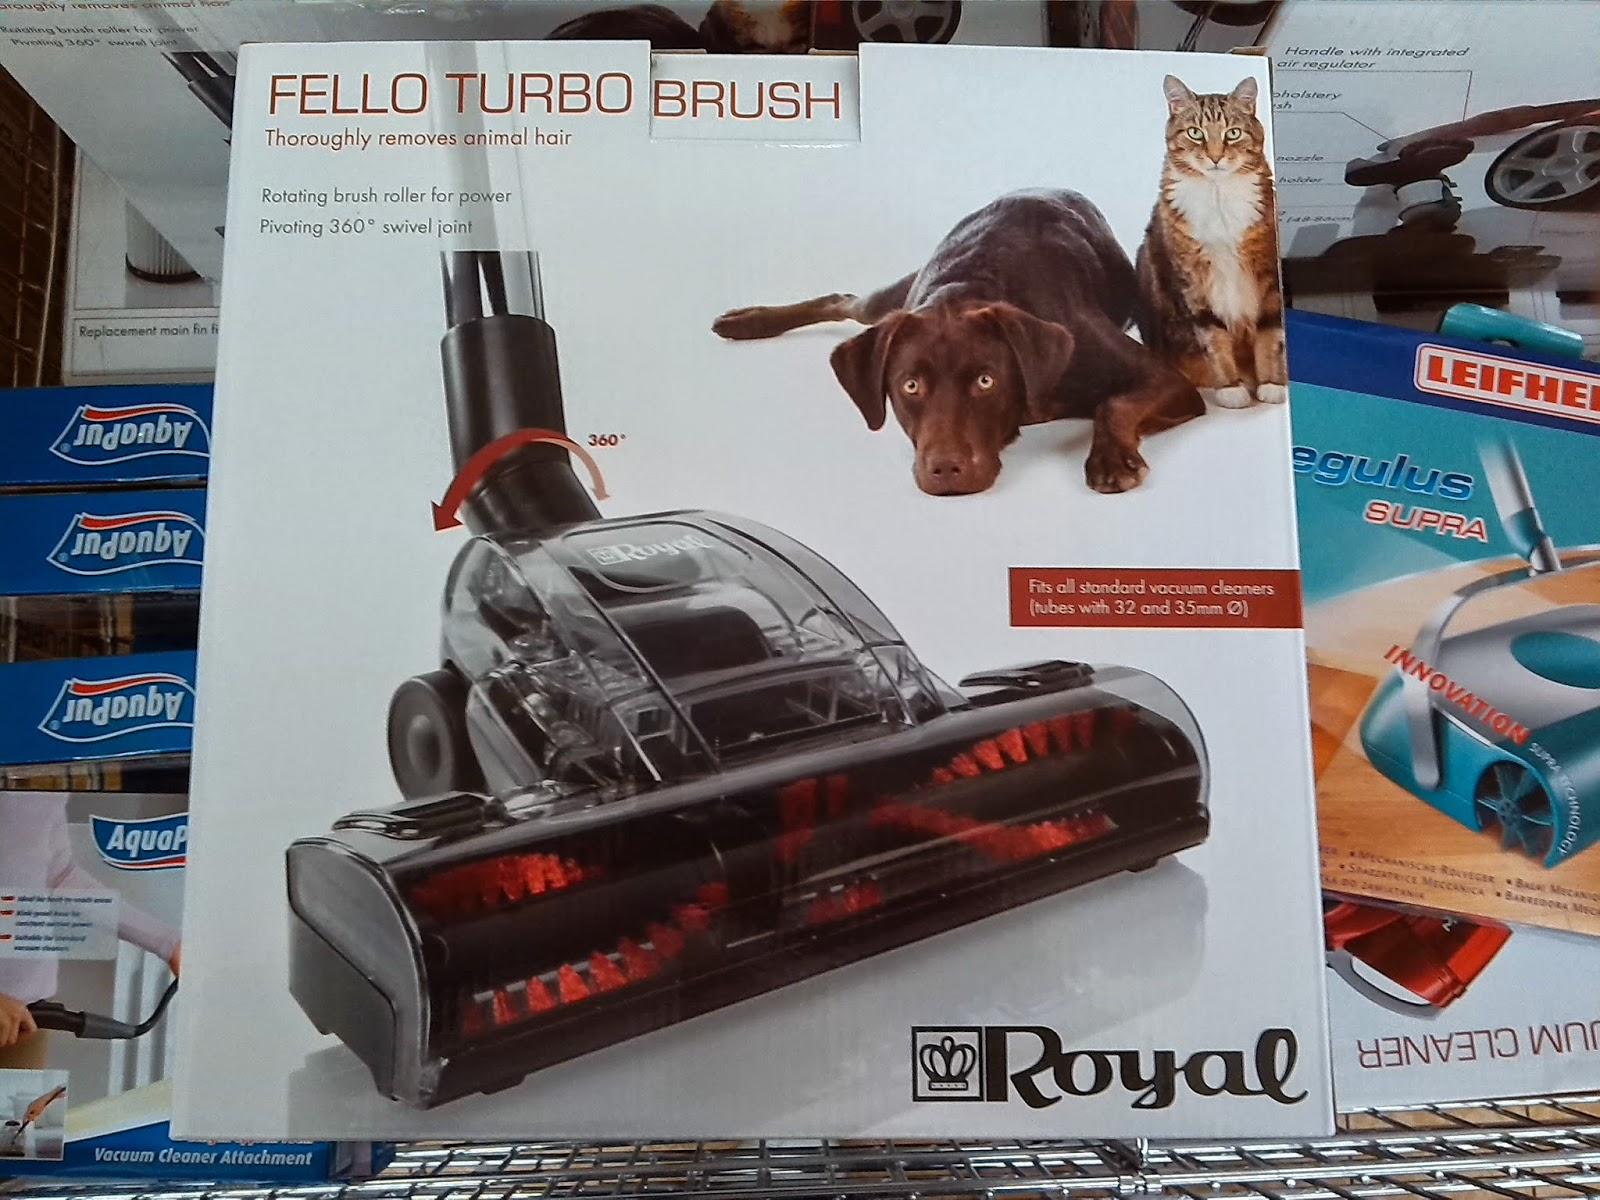 Fello Turbo Brush